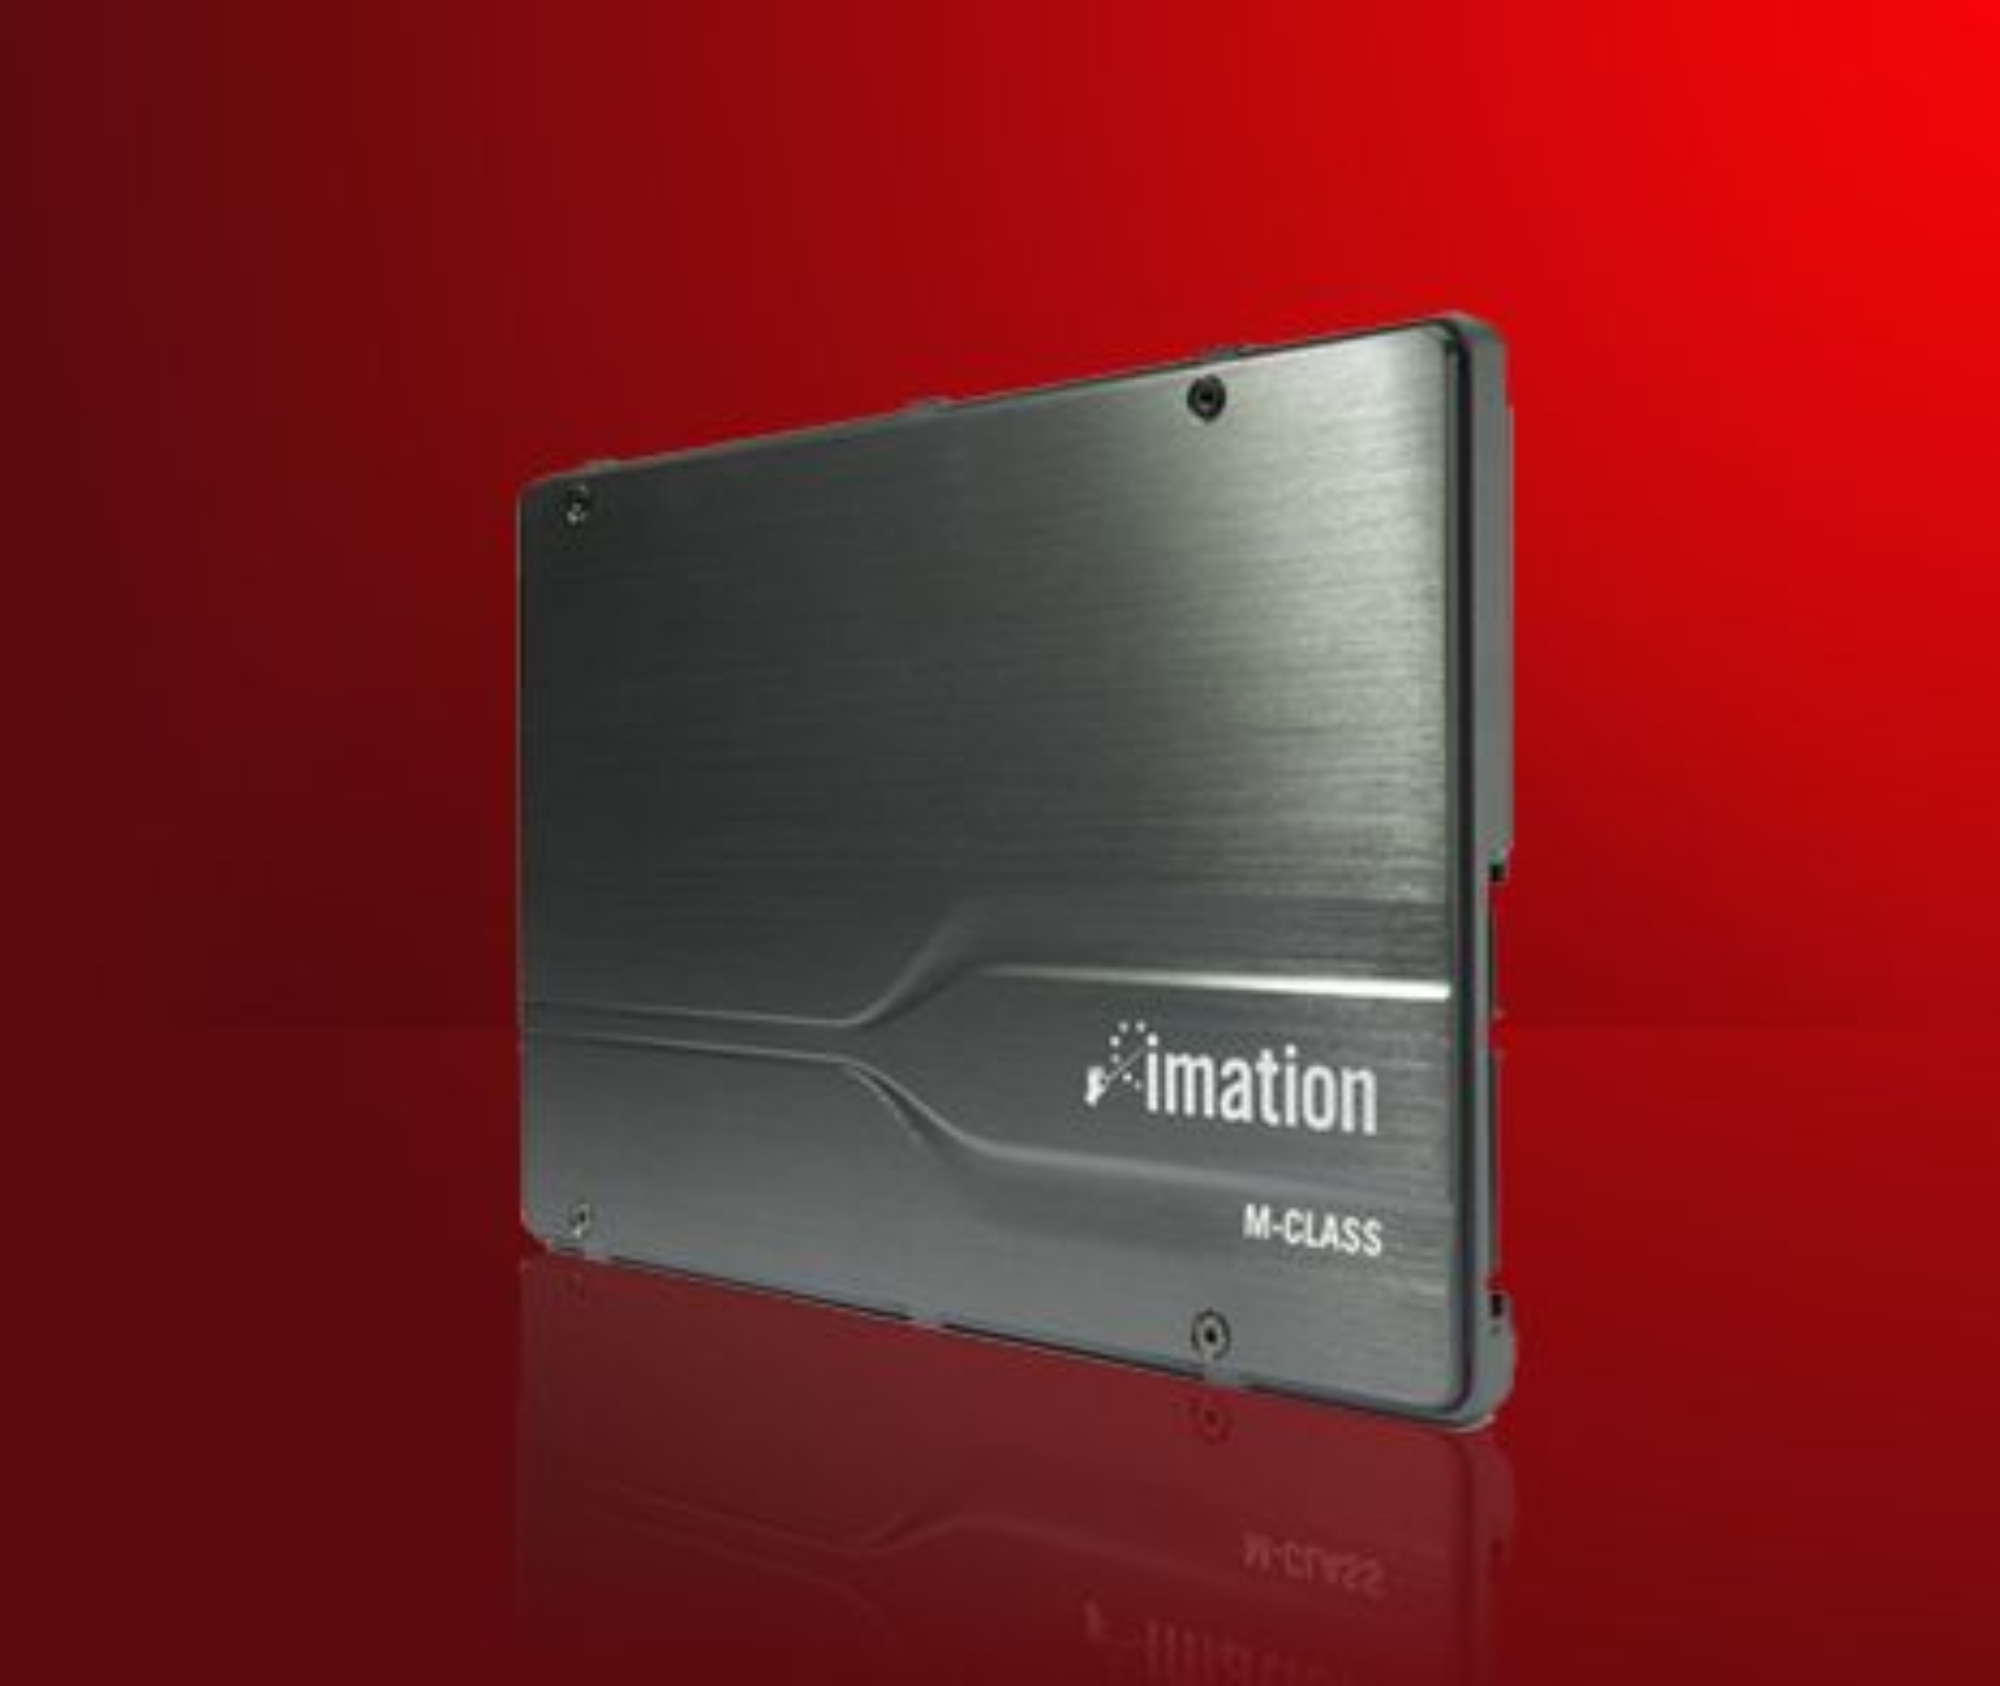 Imation M-class